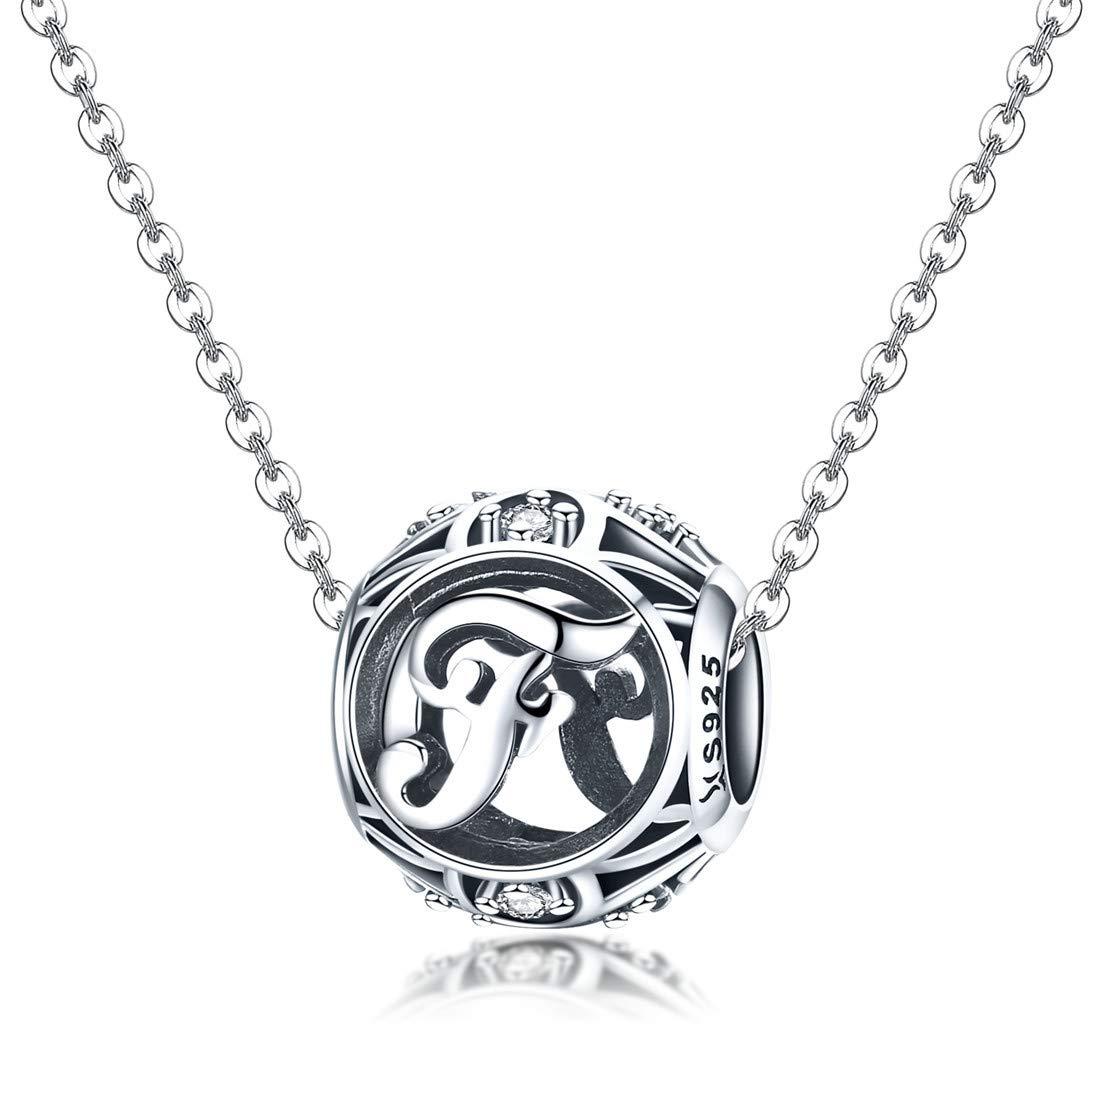 DALARAN Sterling Silber Buchstabe des Alphabets A-Z Charm-Anh/änger f/ür Charms ArmbandMEHRWEG